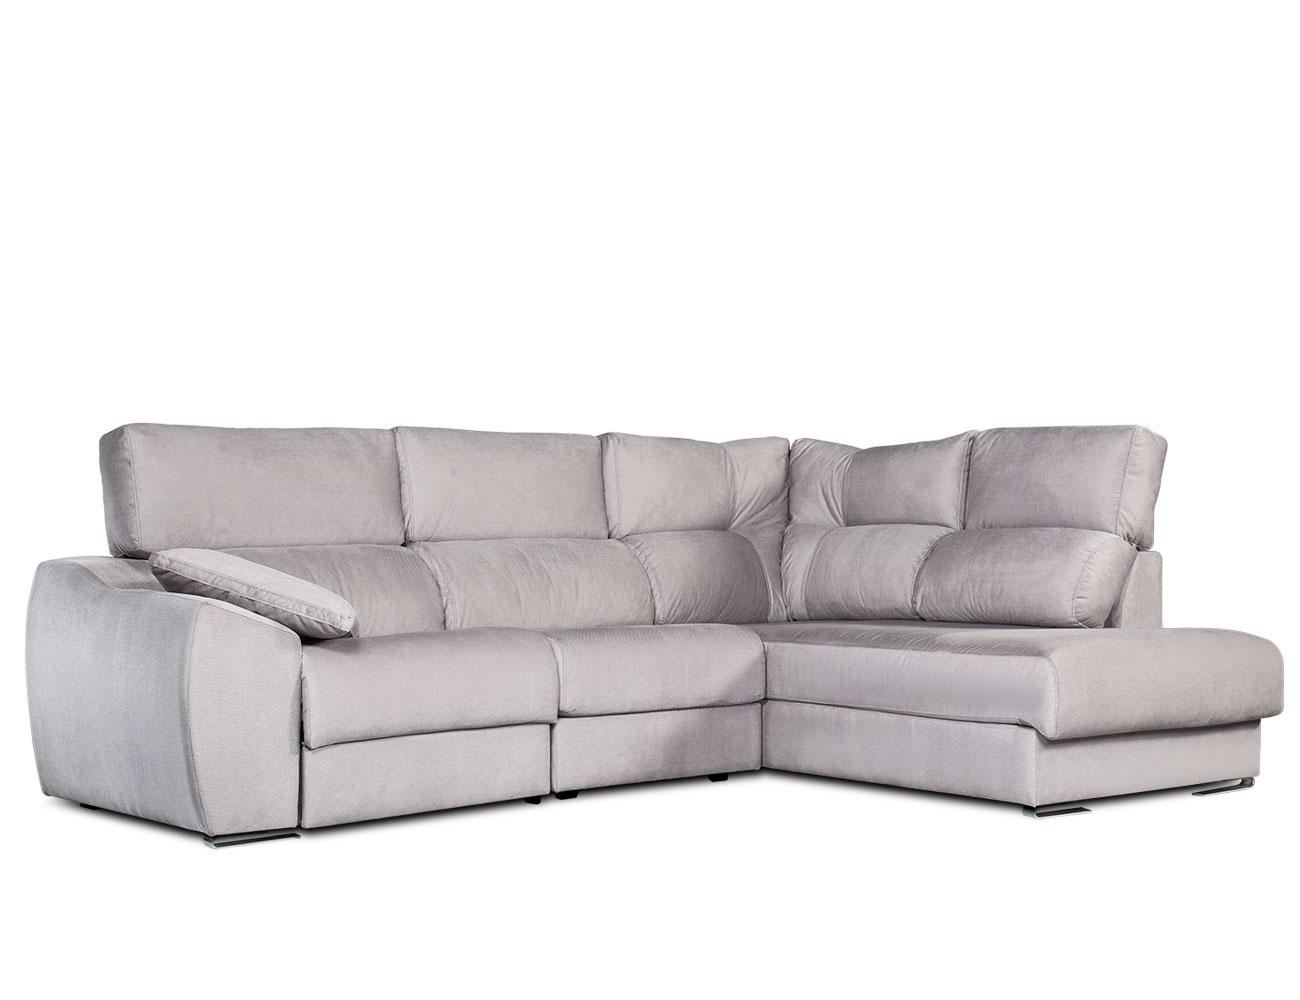 Sofa chaiselongue rincon electrico3